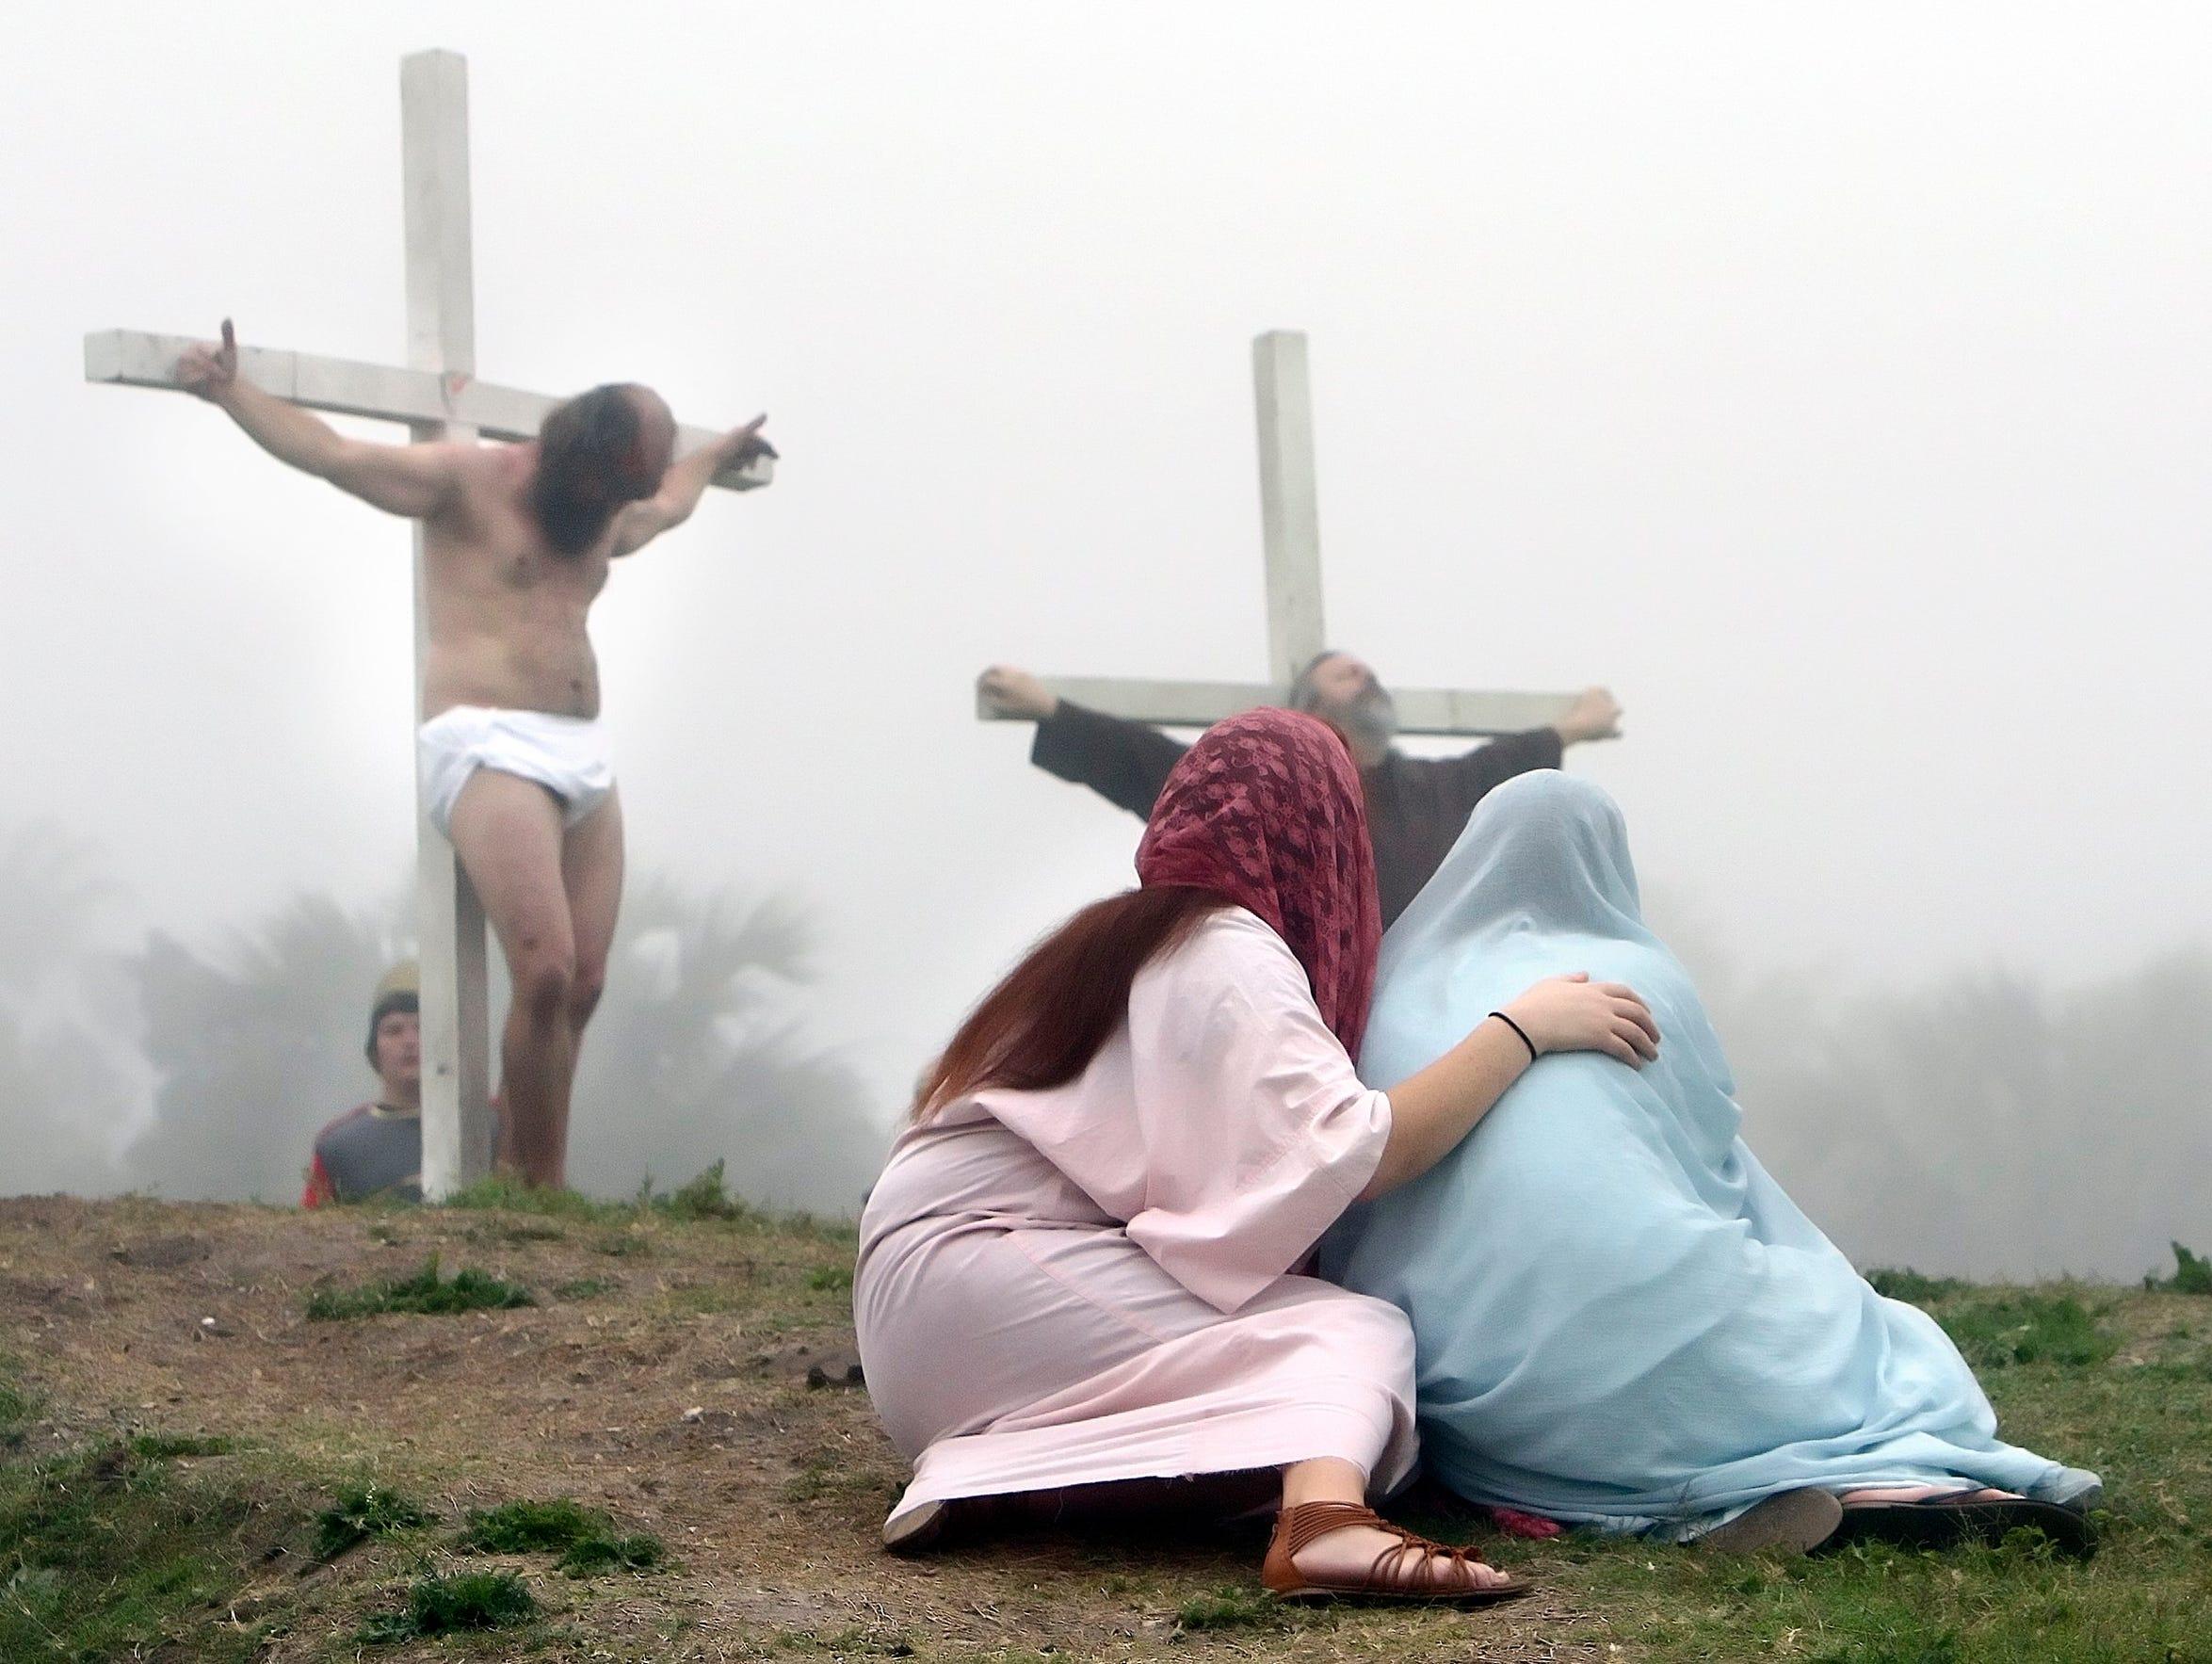 Kiki Pena (left) as Mary Magdalene and Nastassia Abshire